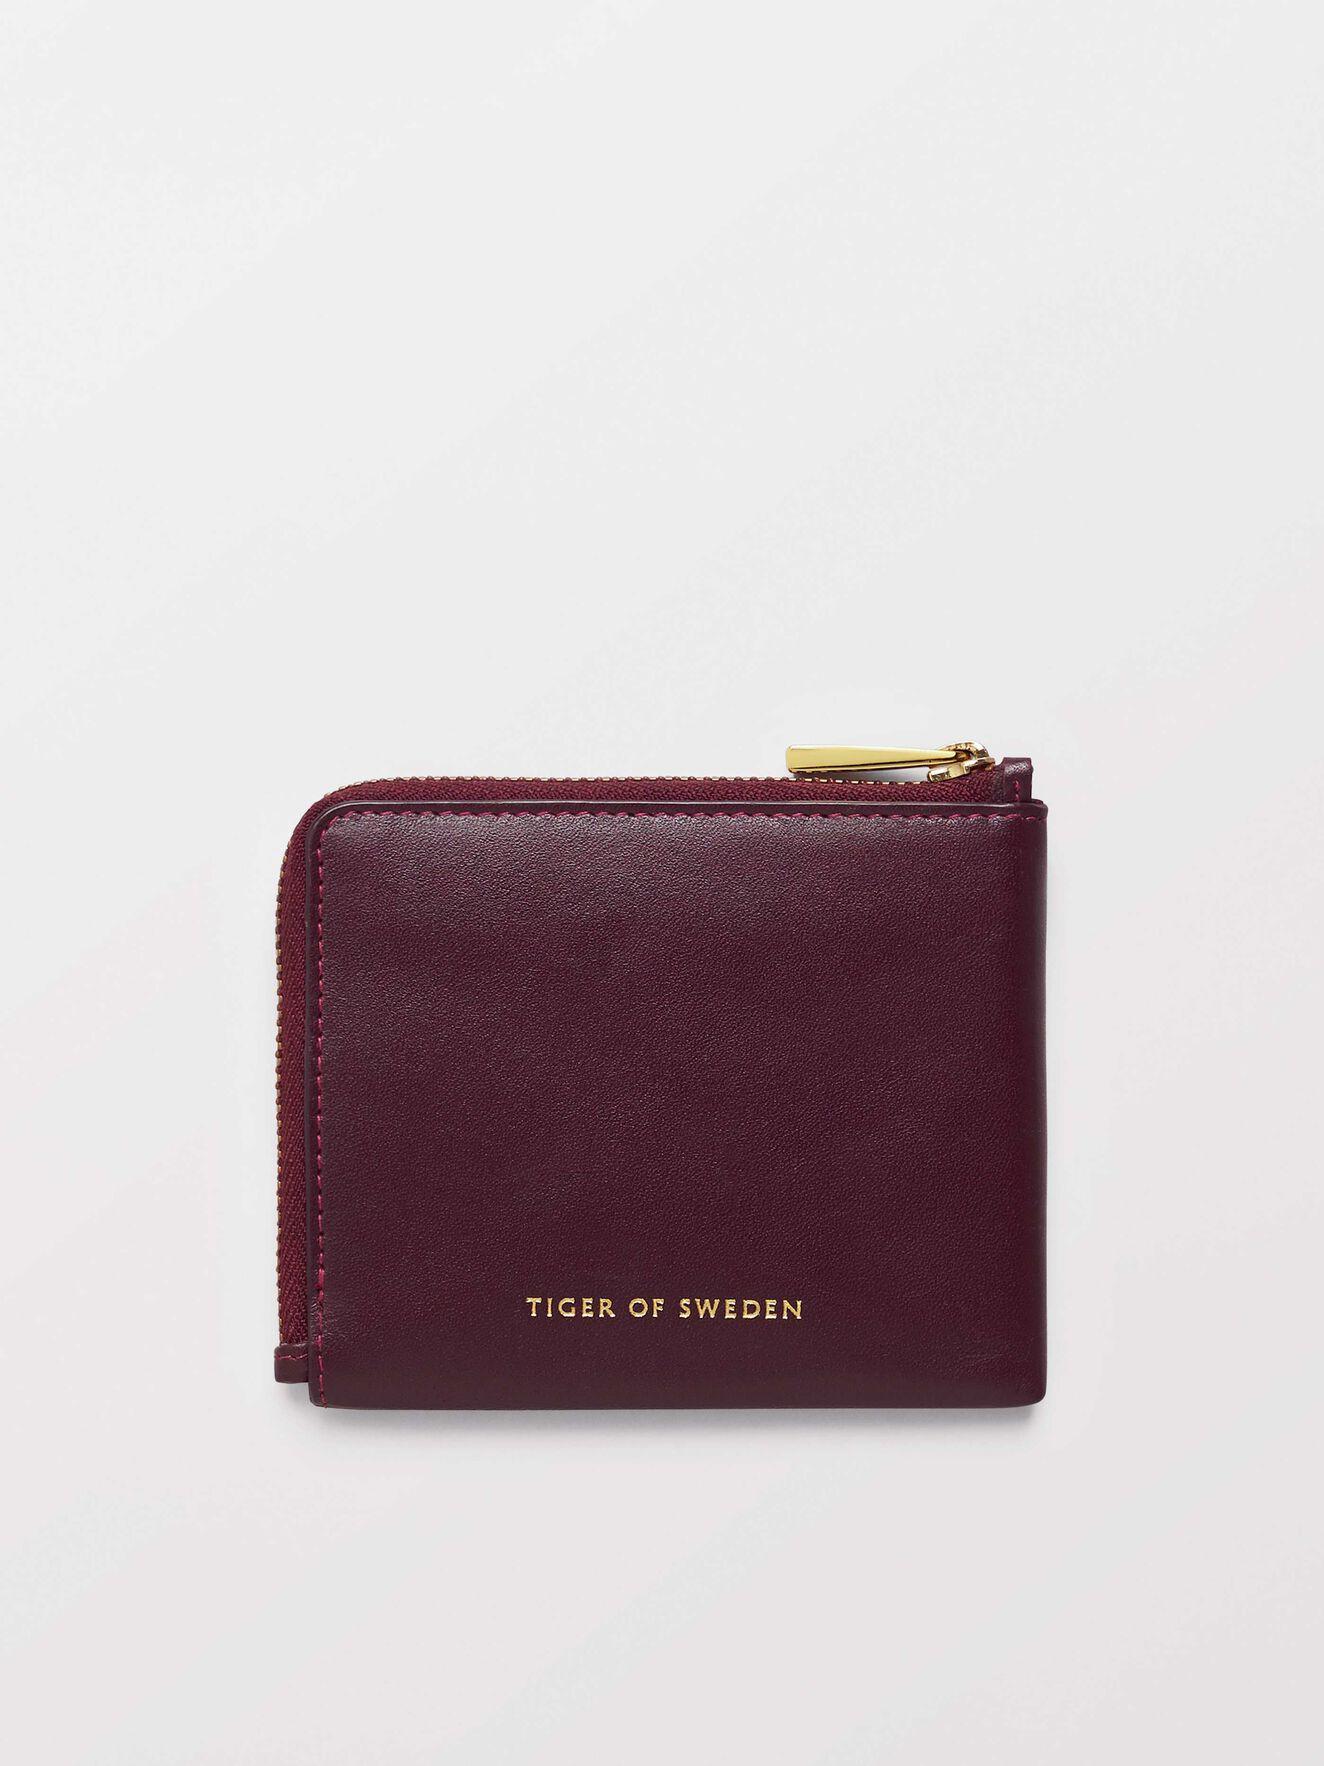 Wortafo Wallet in Noon Plum from Tiger of Sweden